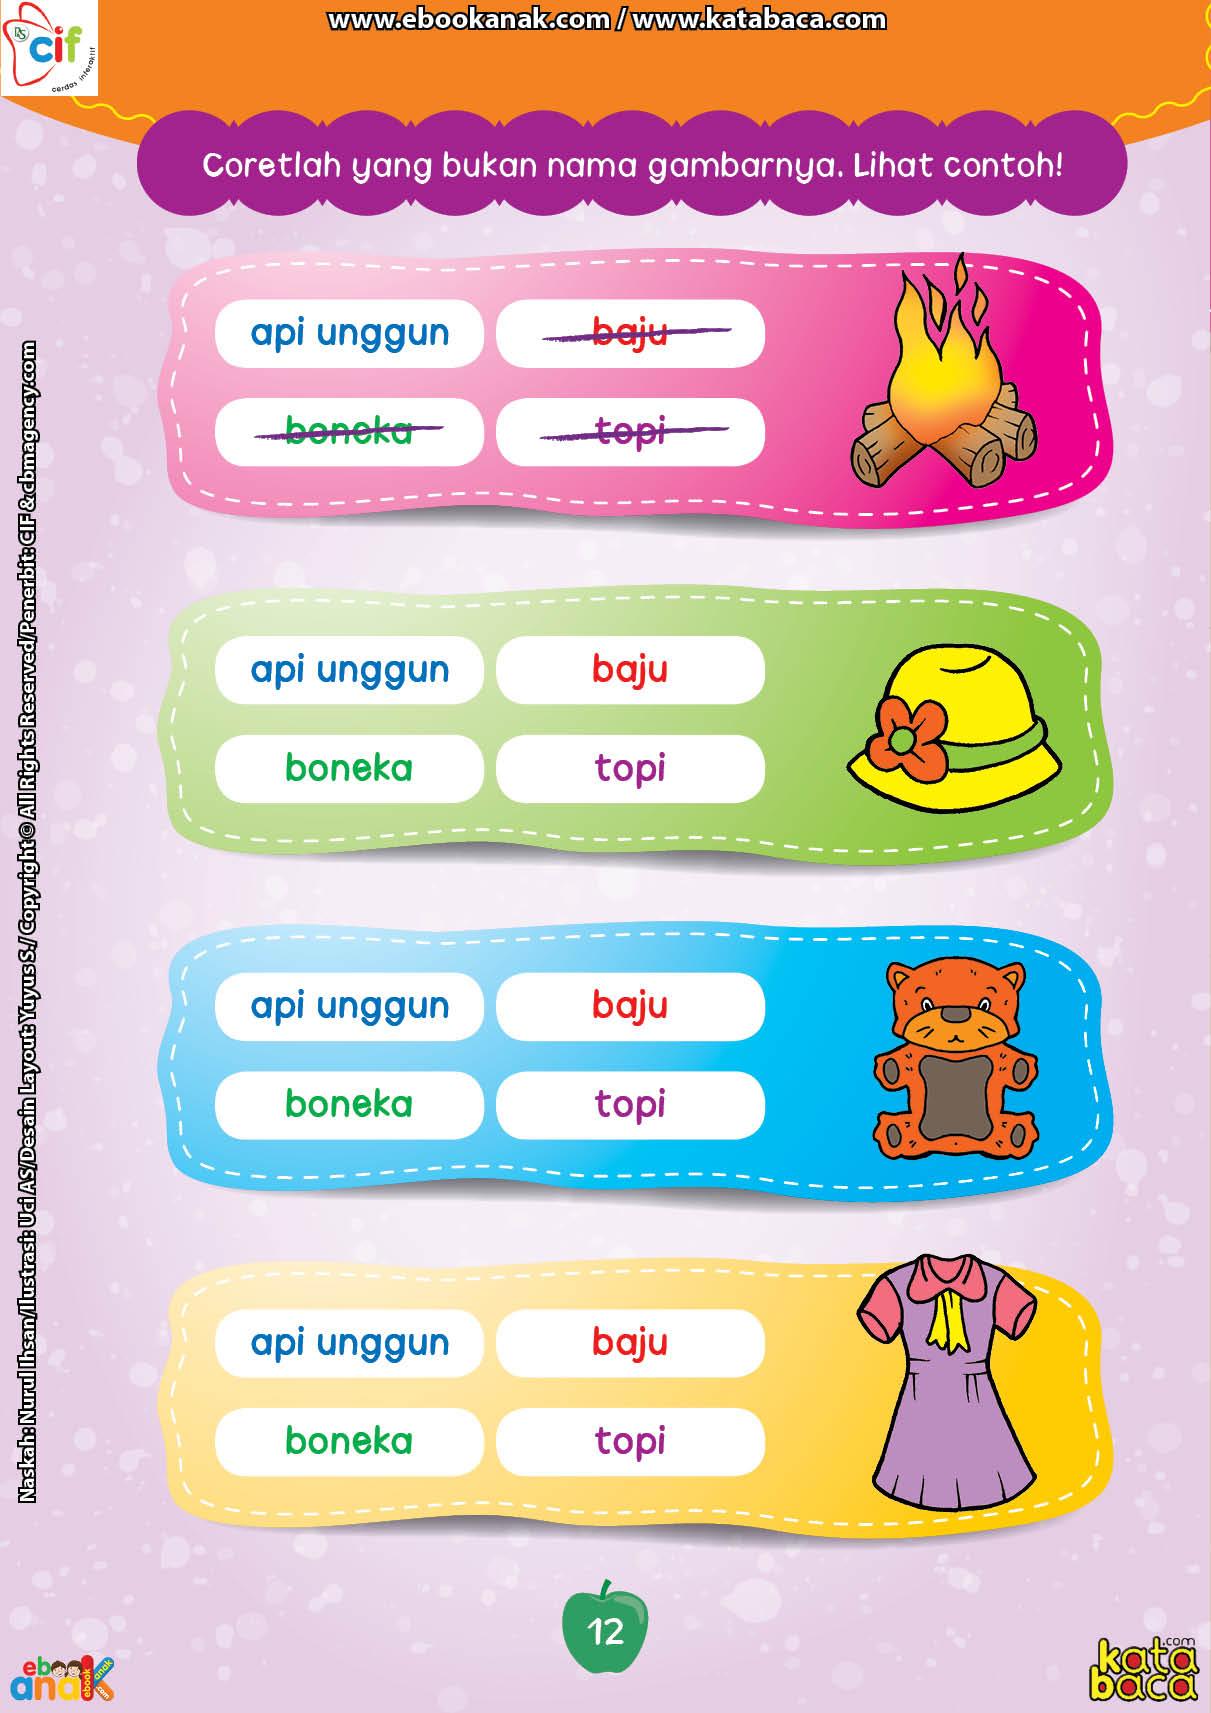 Mencari Kata Atau Kalimat Yang Sesuai Dengan Gambar Ebook Anak